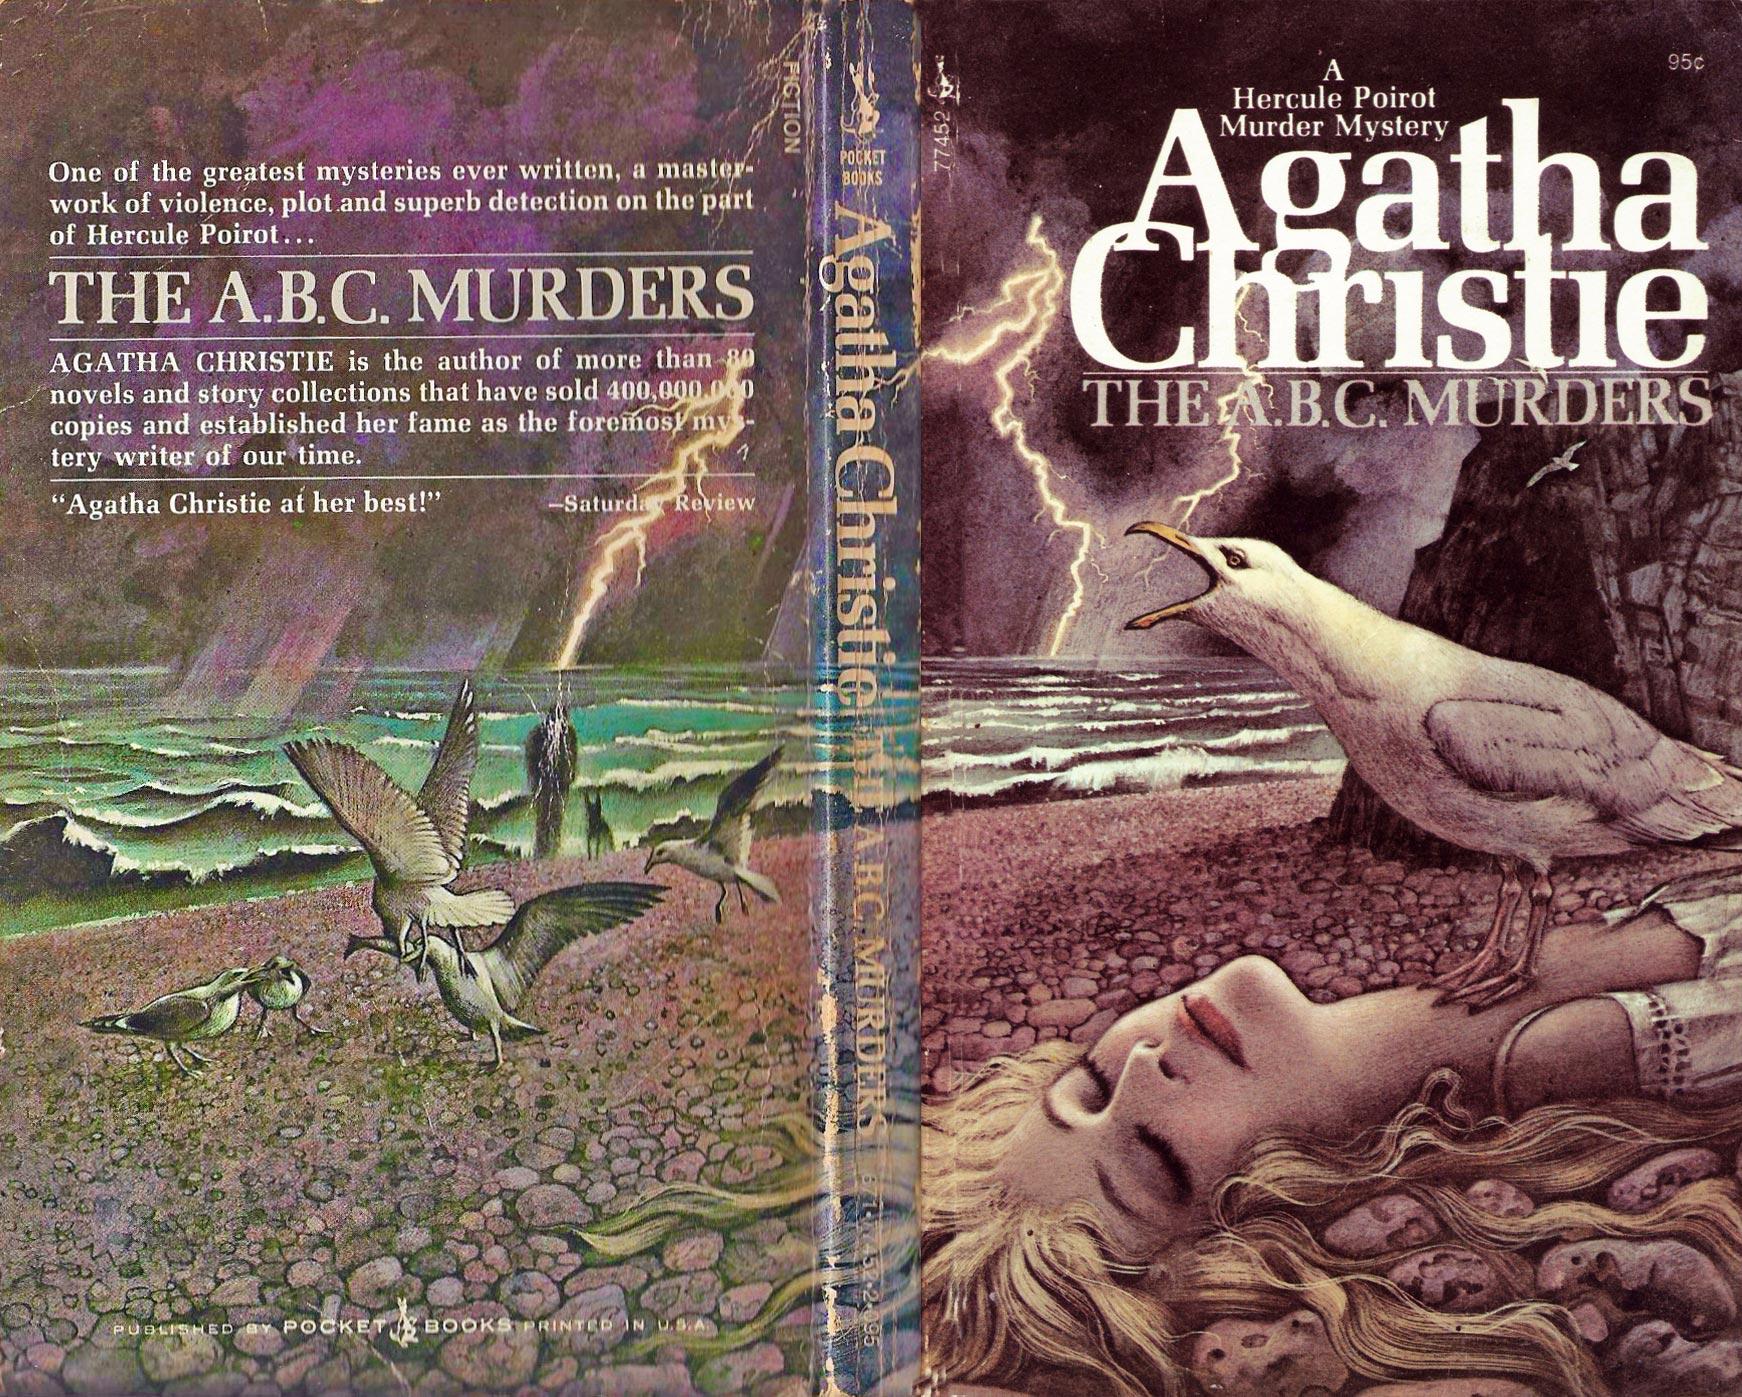 Agatha Christie Tom Adams The ABC Murders Pocket Books sm